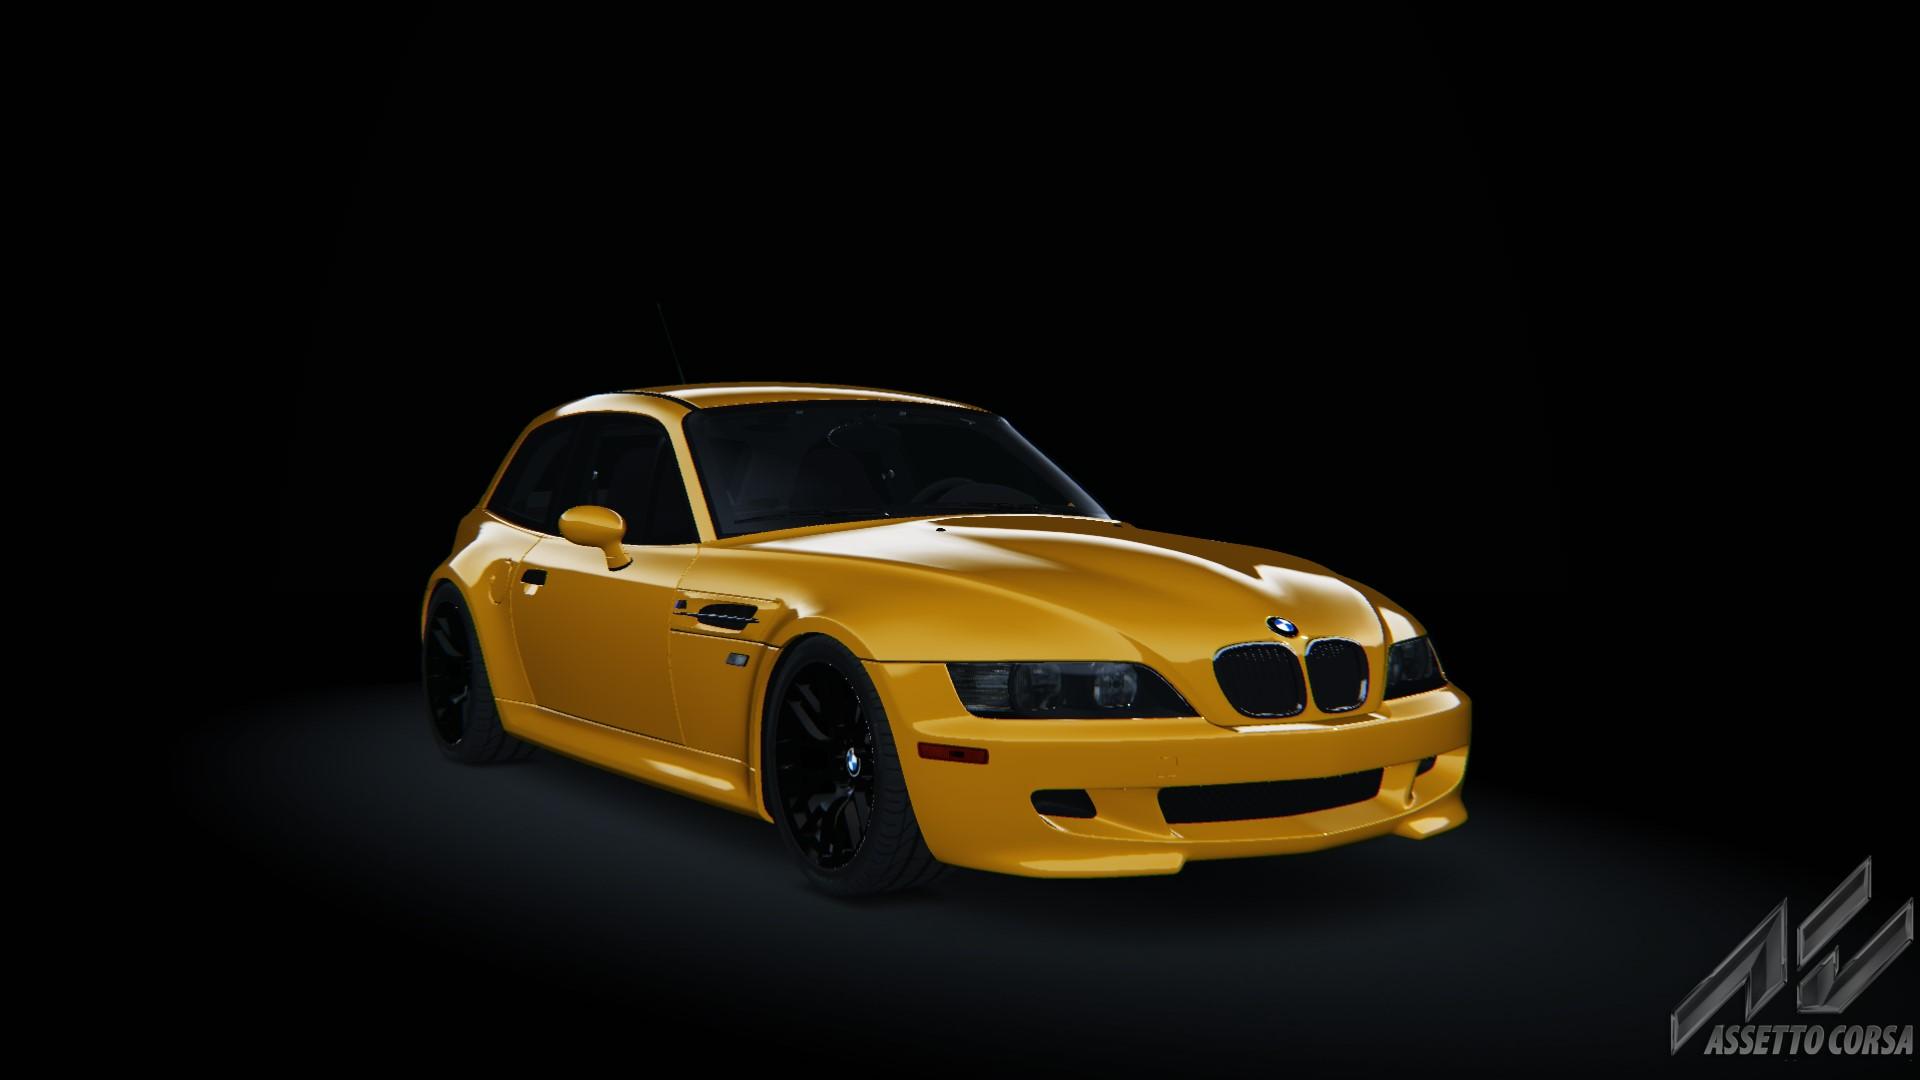 Bmw Z3 M Coupe S54 Bmw Car Detail Assetto Corsa Database